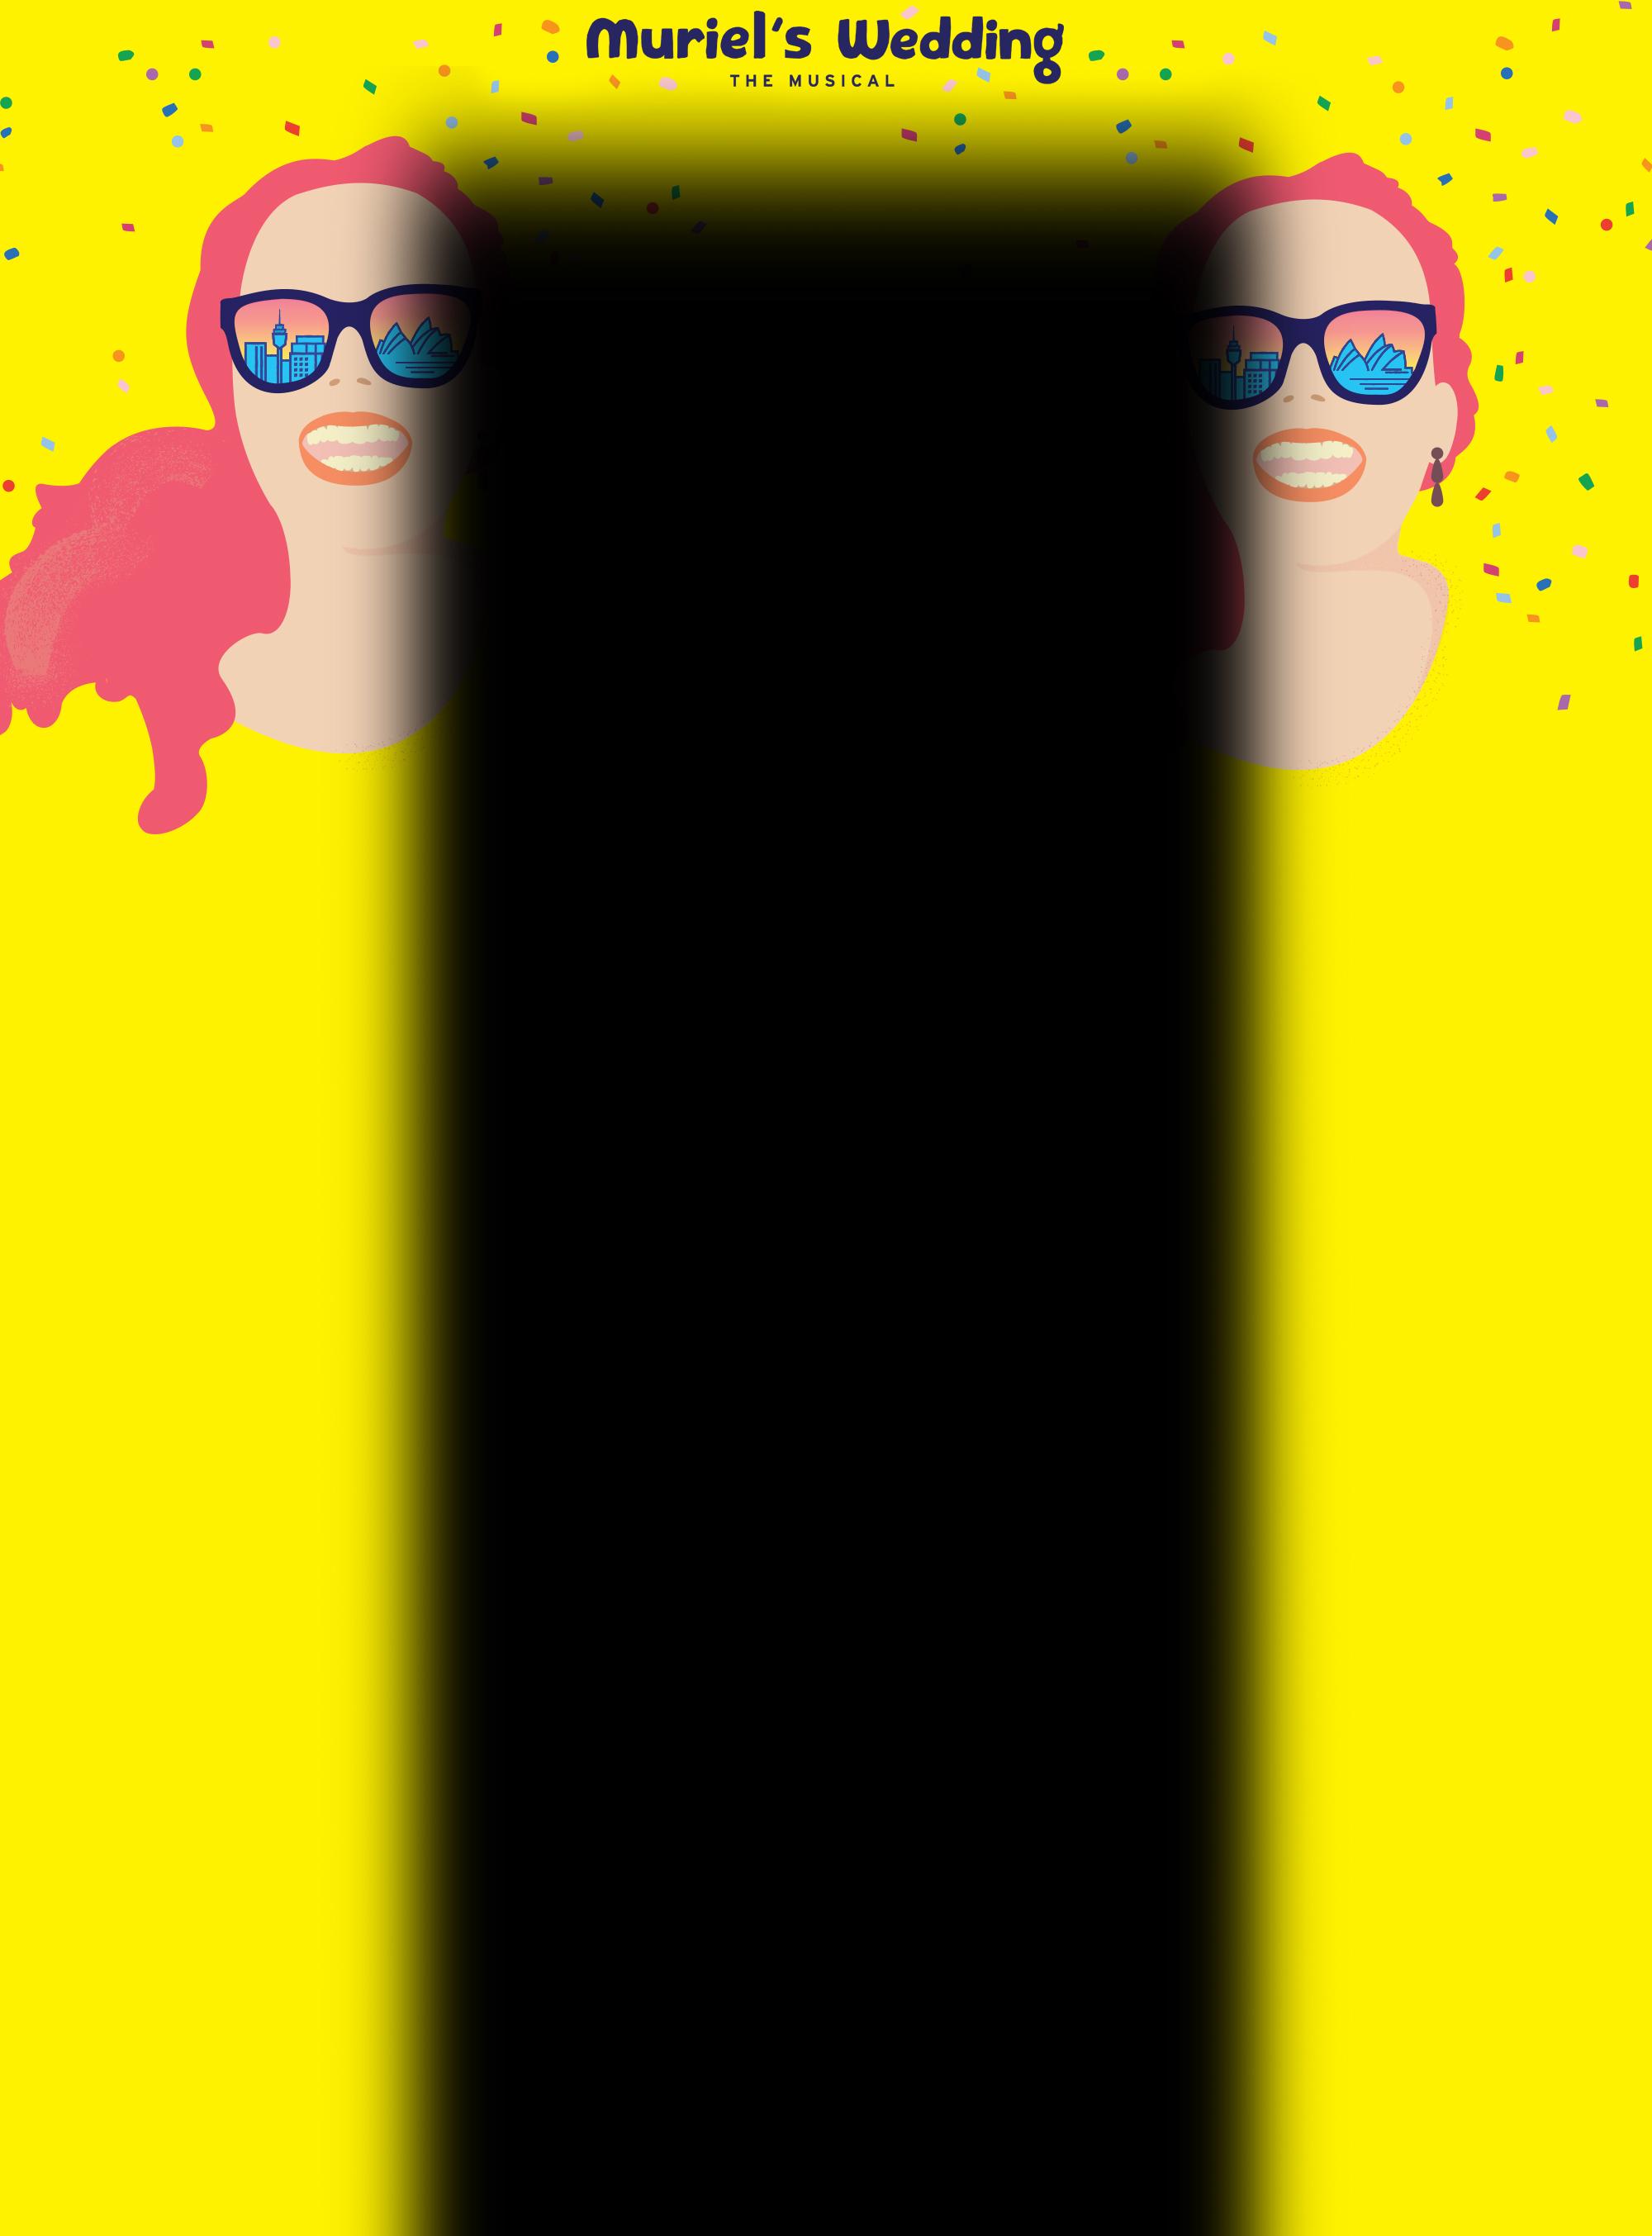 muriel-s-background-new-size-v2.jpg